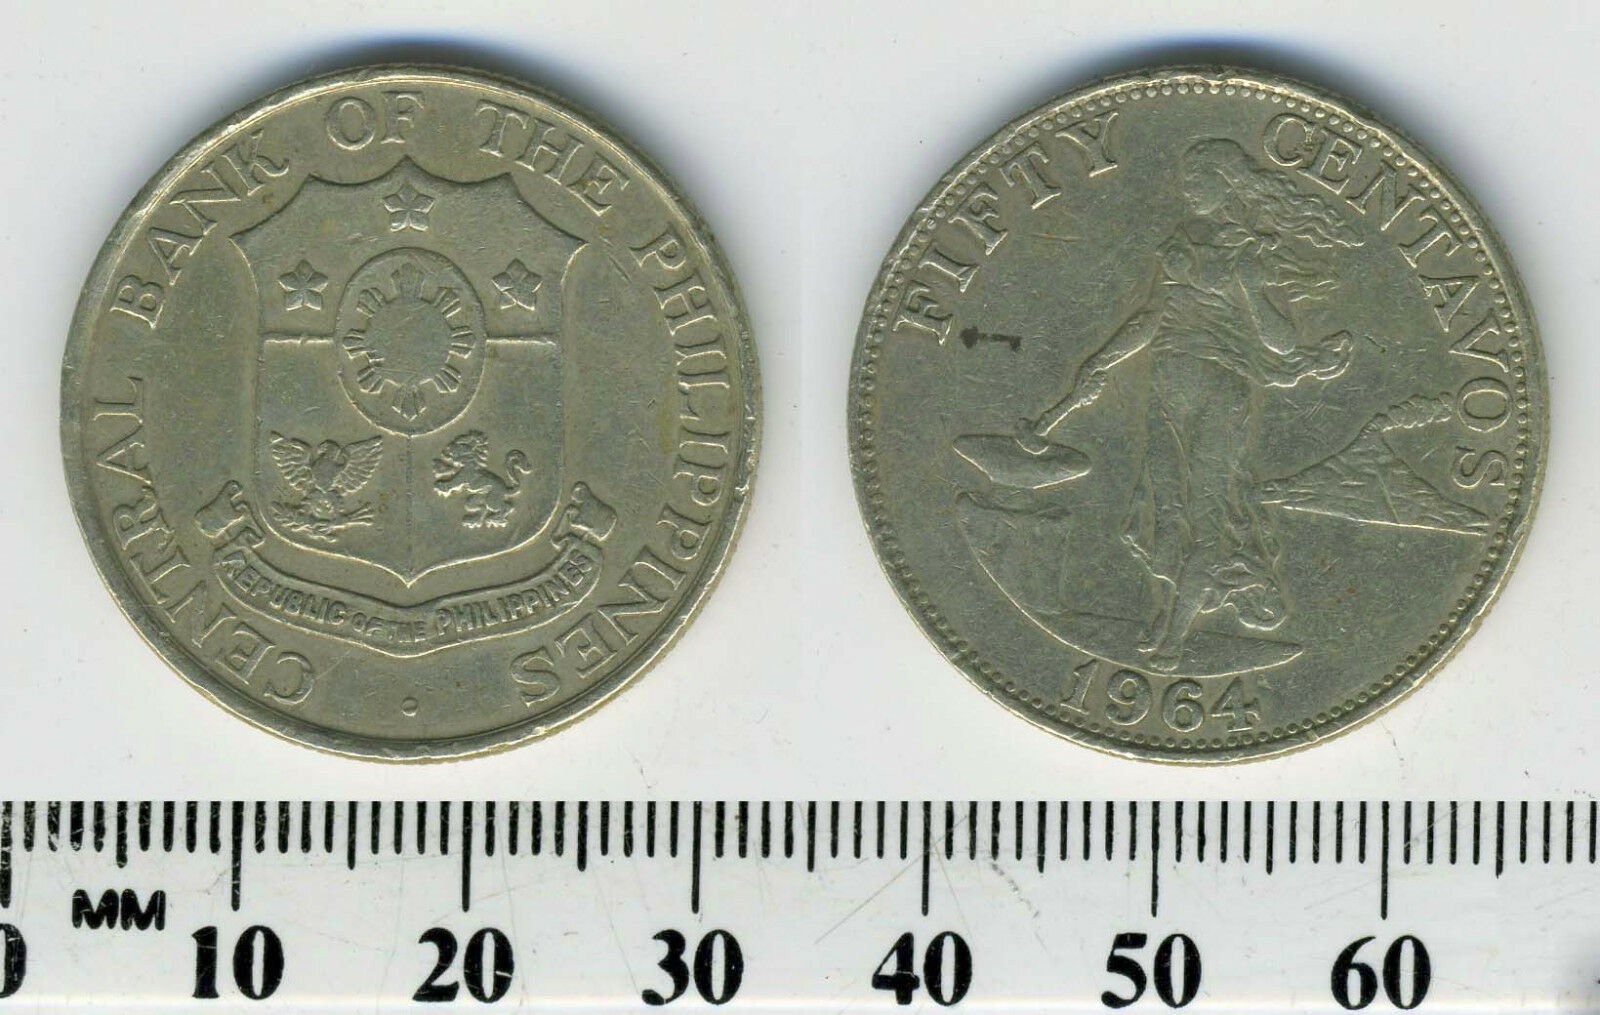 Philippines 1966-25 Centavos Copper-Nickel-Zinc Coin #1 Female standing